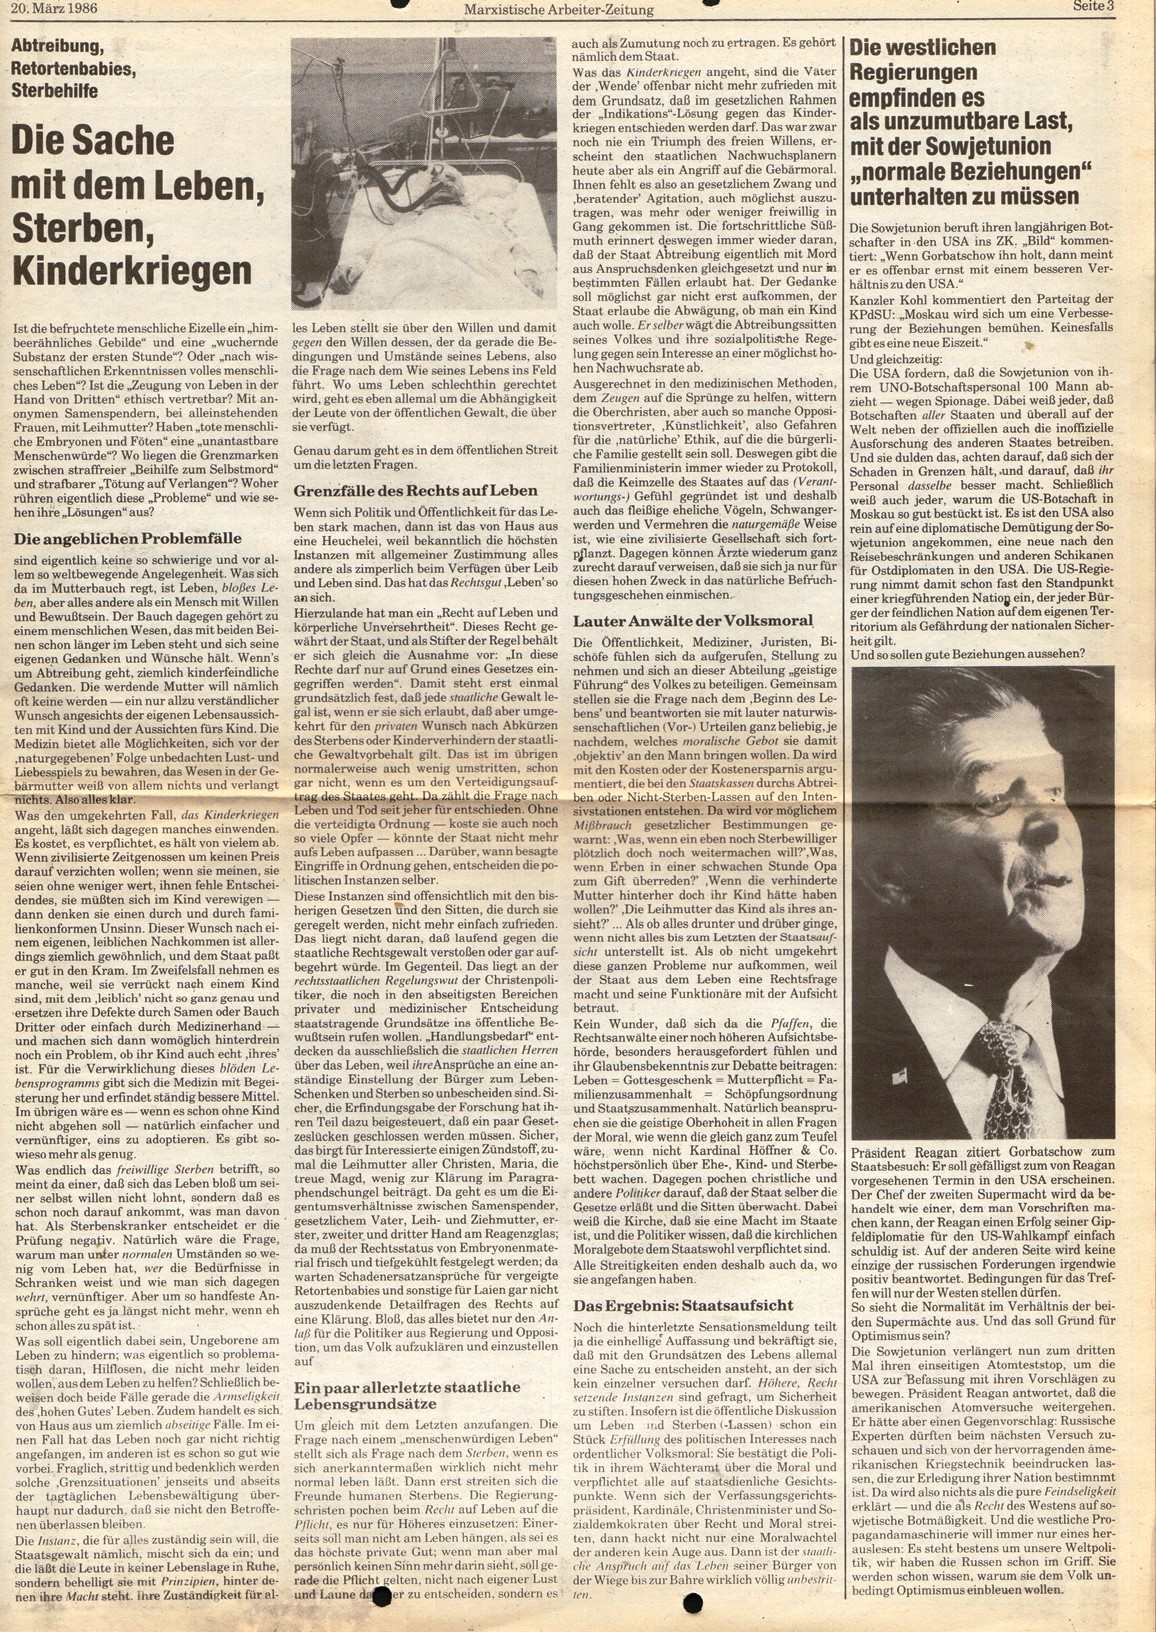 Muenchen_MG_MAZ_AGFA_19860320_03